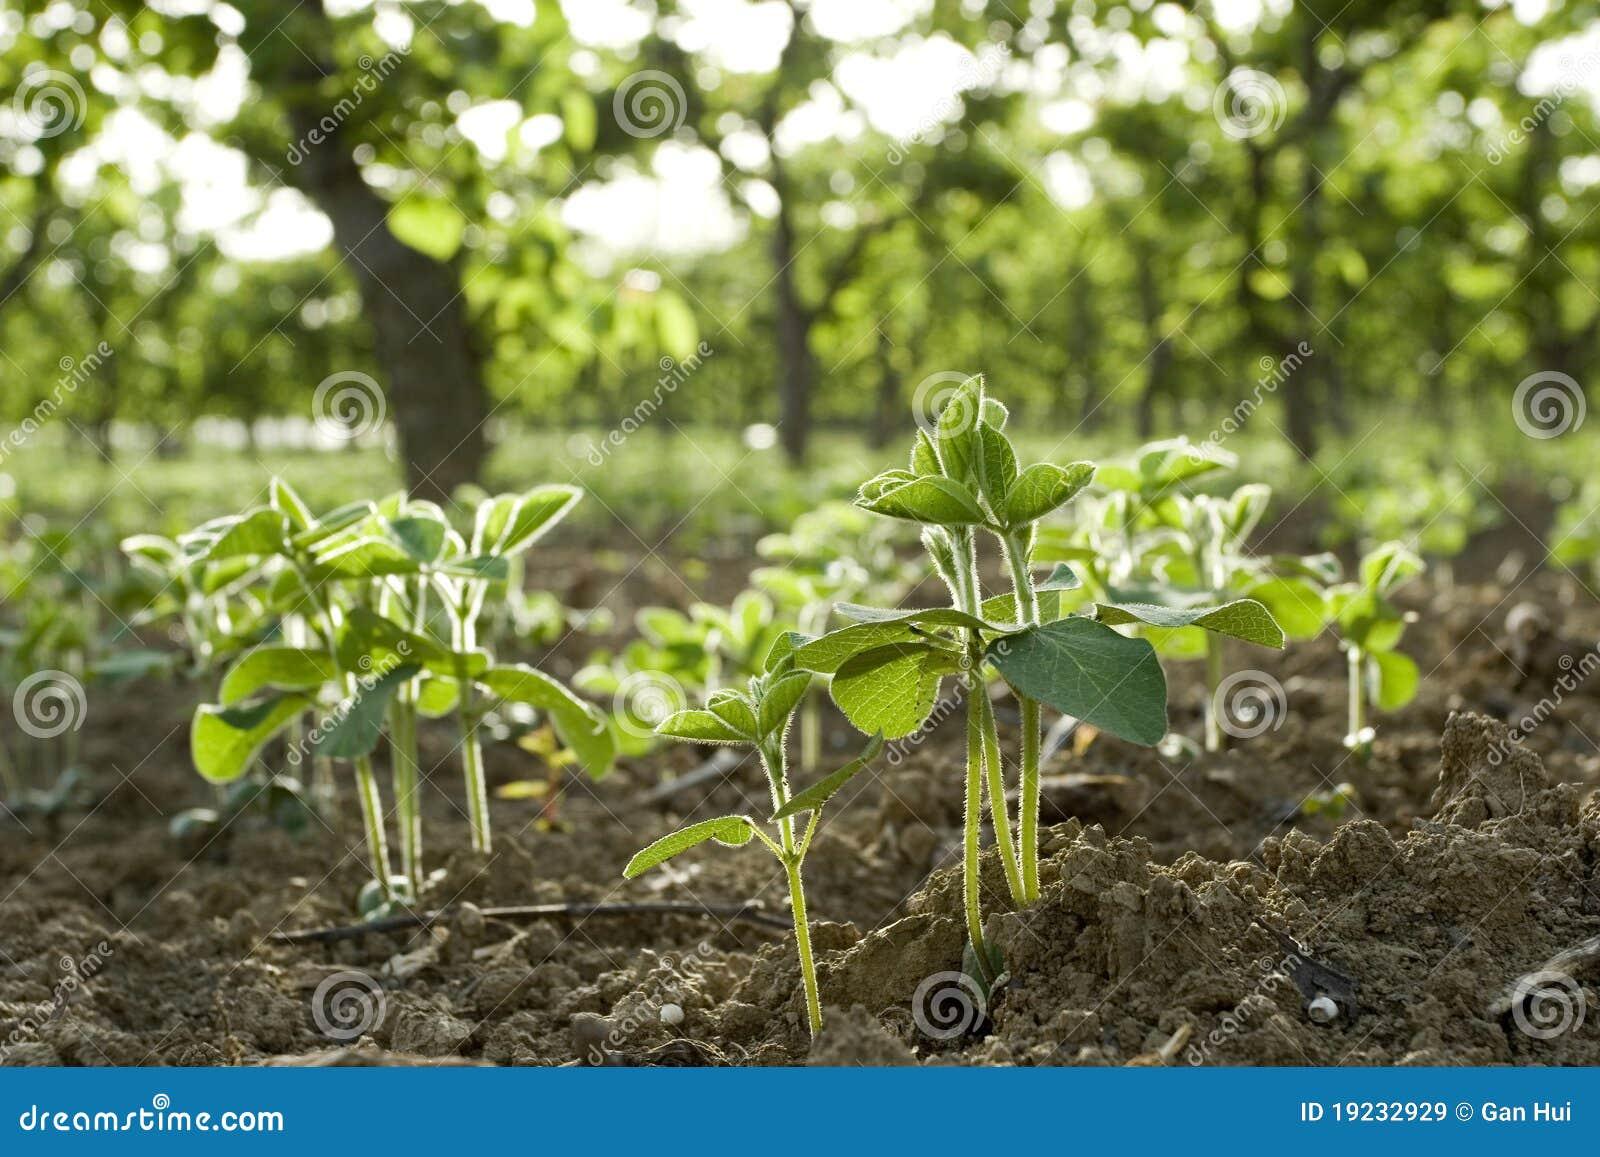 plante d 39 haricots image stock image du haricot nature 19232929. Black Bedroom Furniture Sets. Home Design Ideas